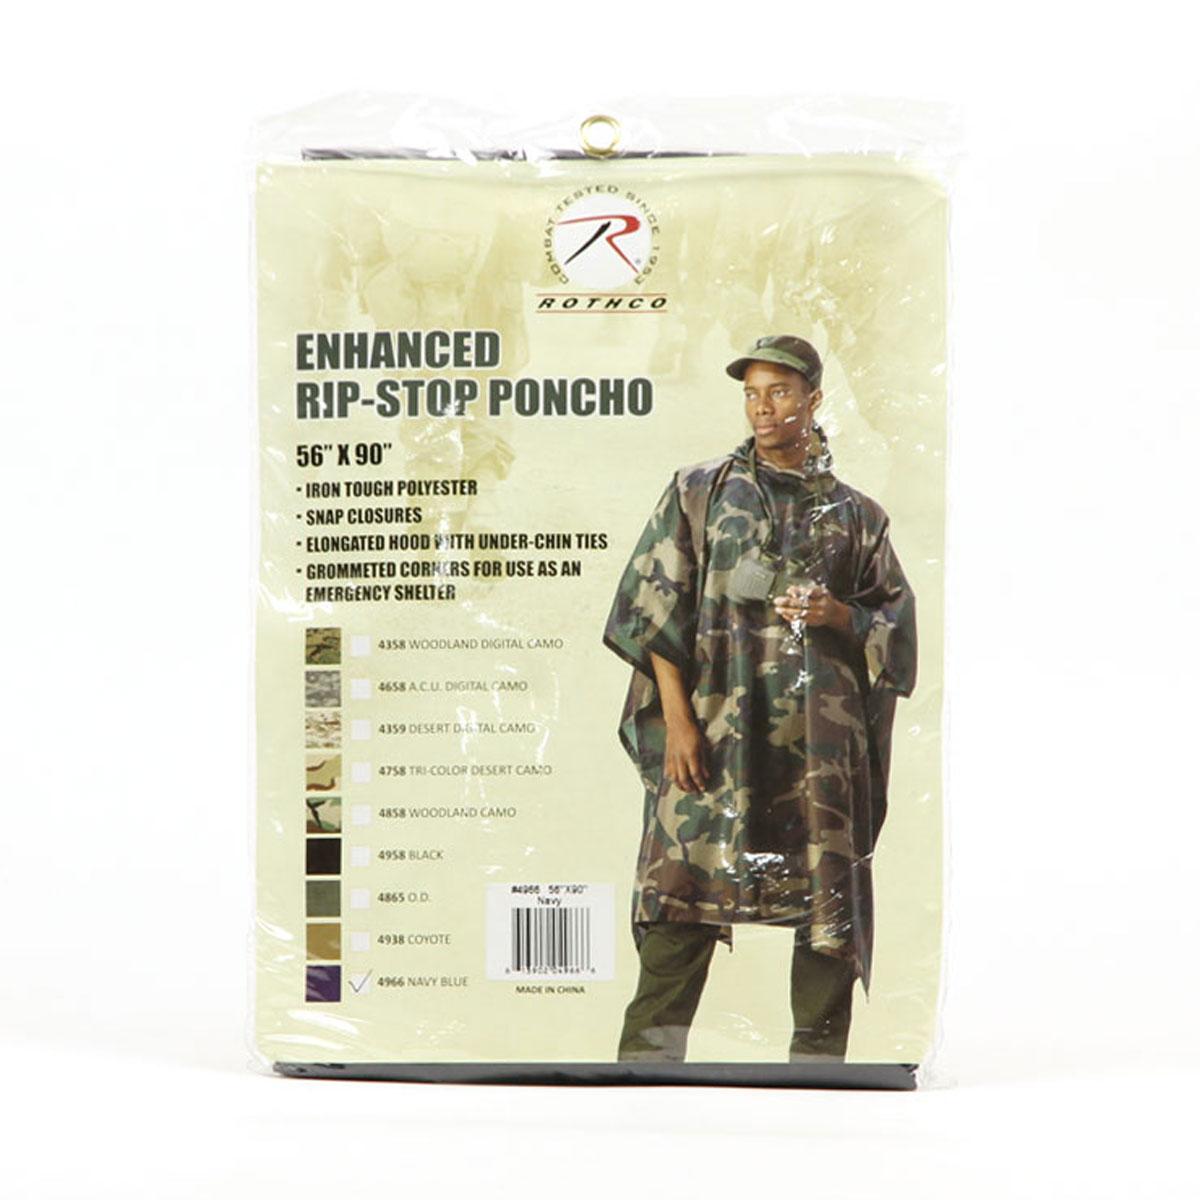 Rothko ROTHCO genuine men's raincoat G... I... Type Navy Blue Rip-Stop Poncho 4966